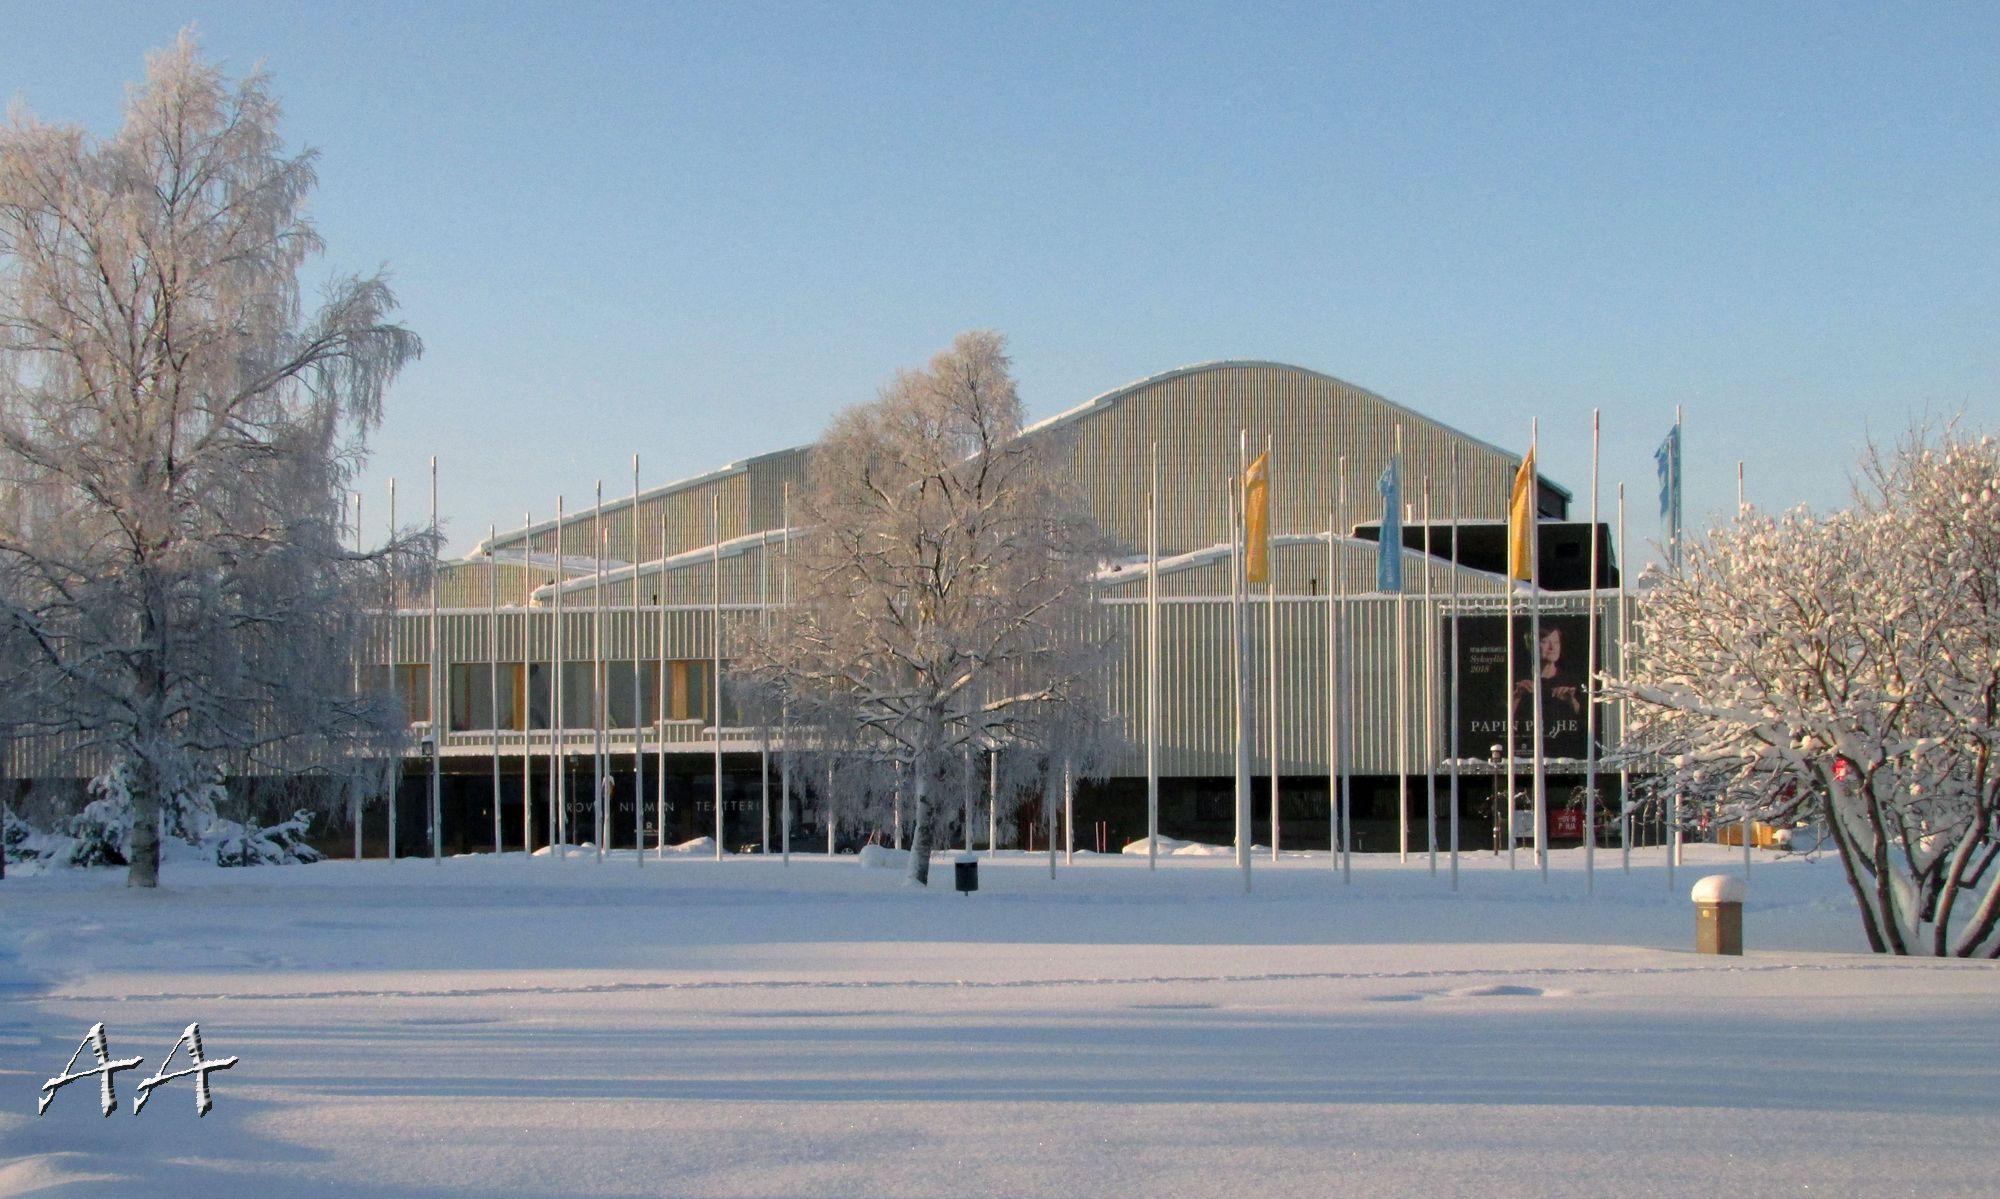 Lappia Hall By Architect Alvar Aalto Rovaniemi Photo Aili A